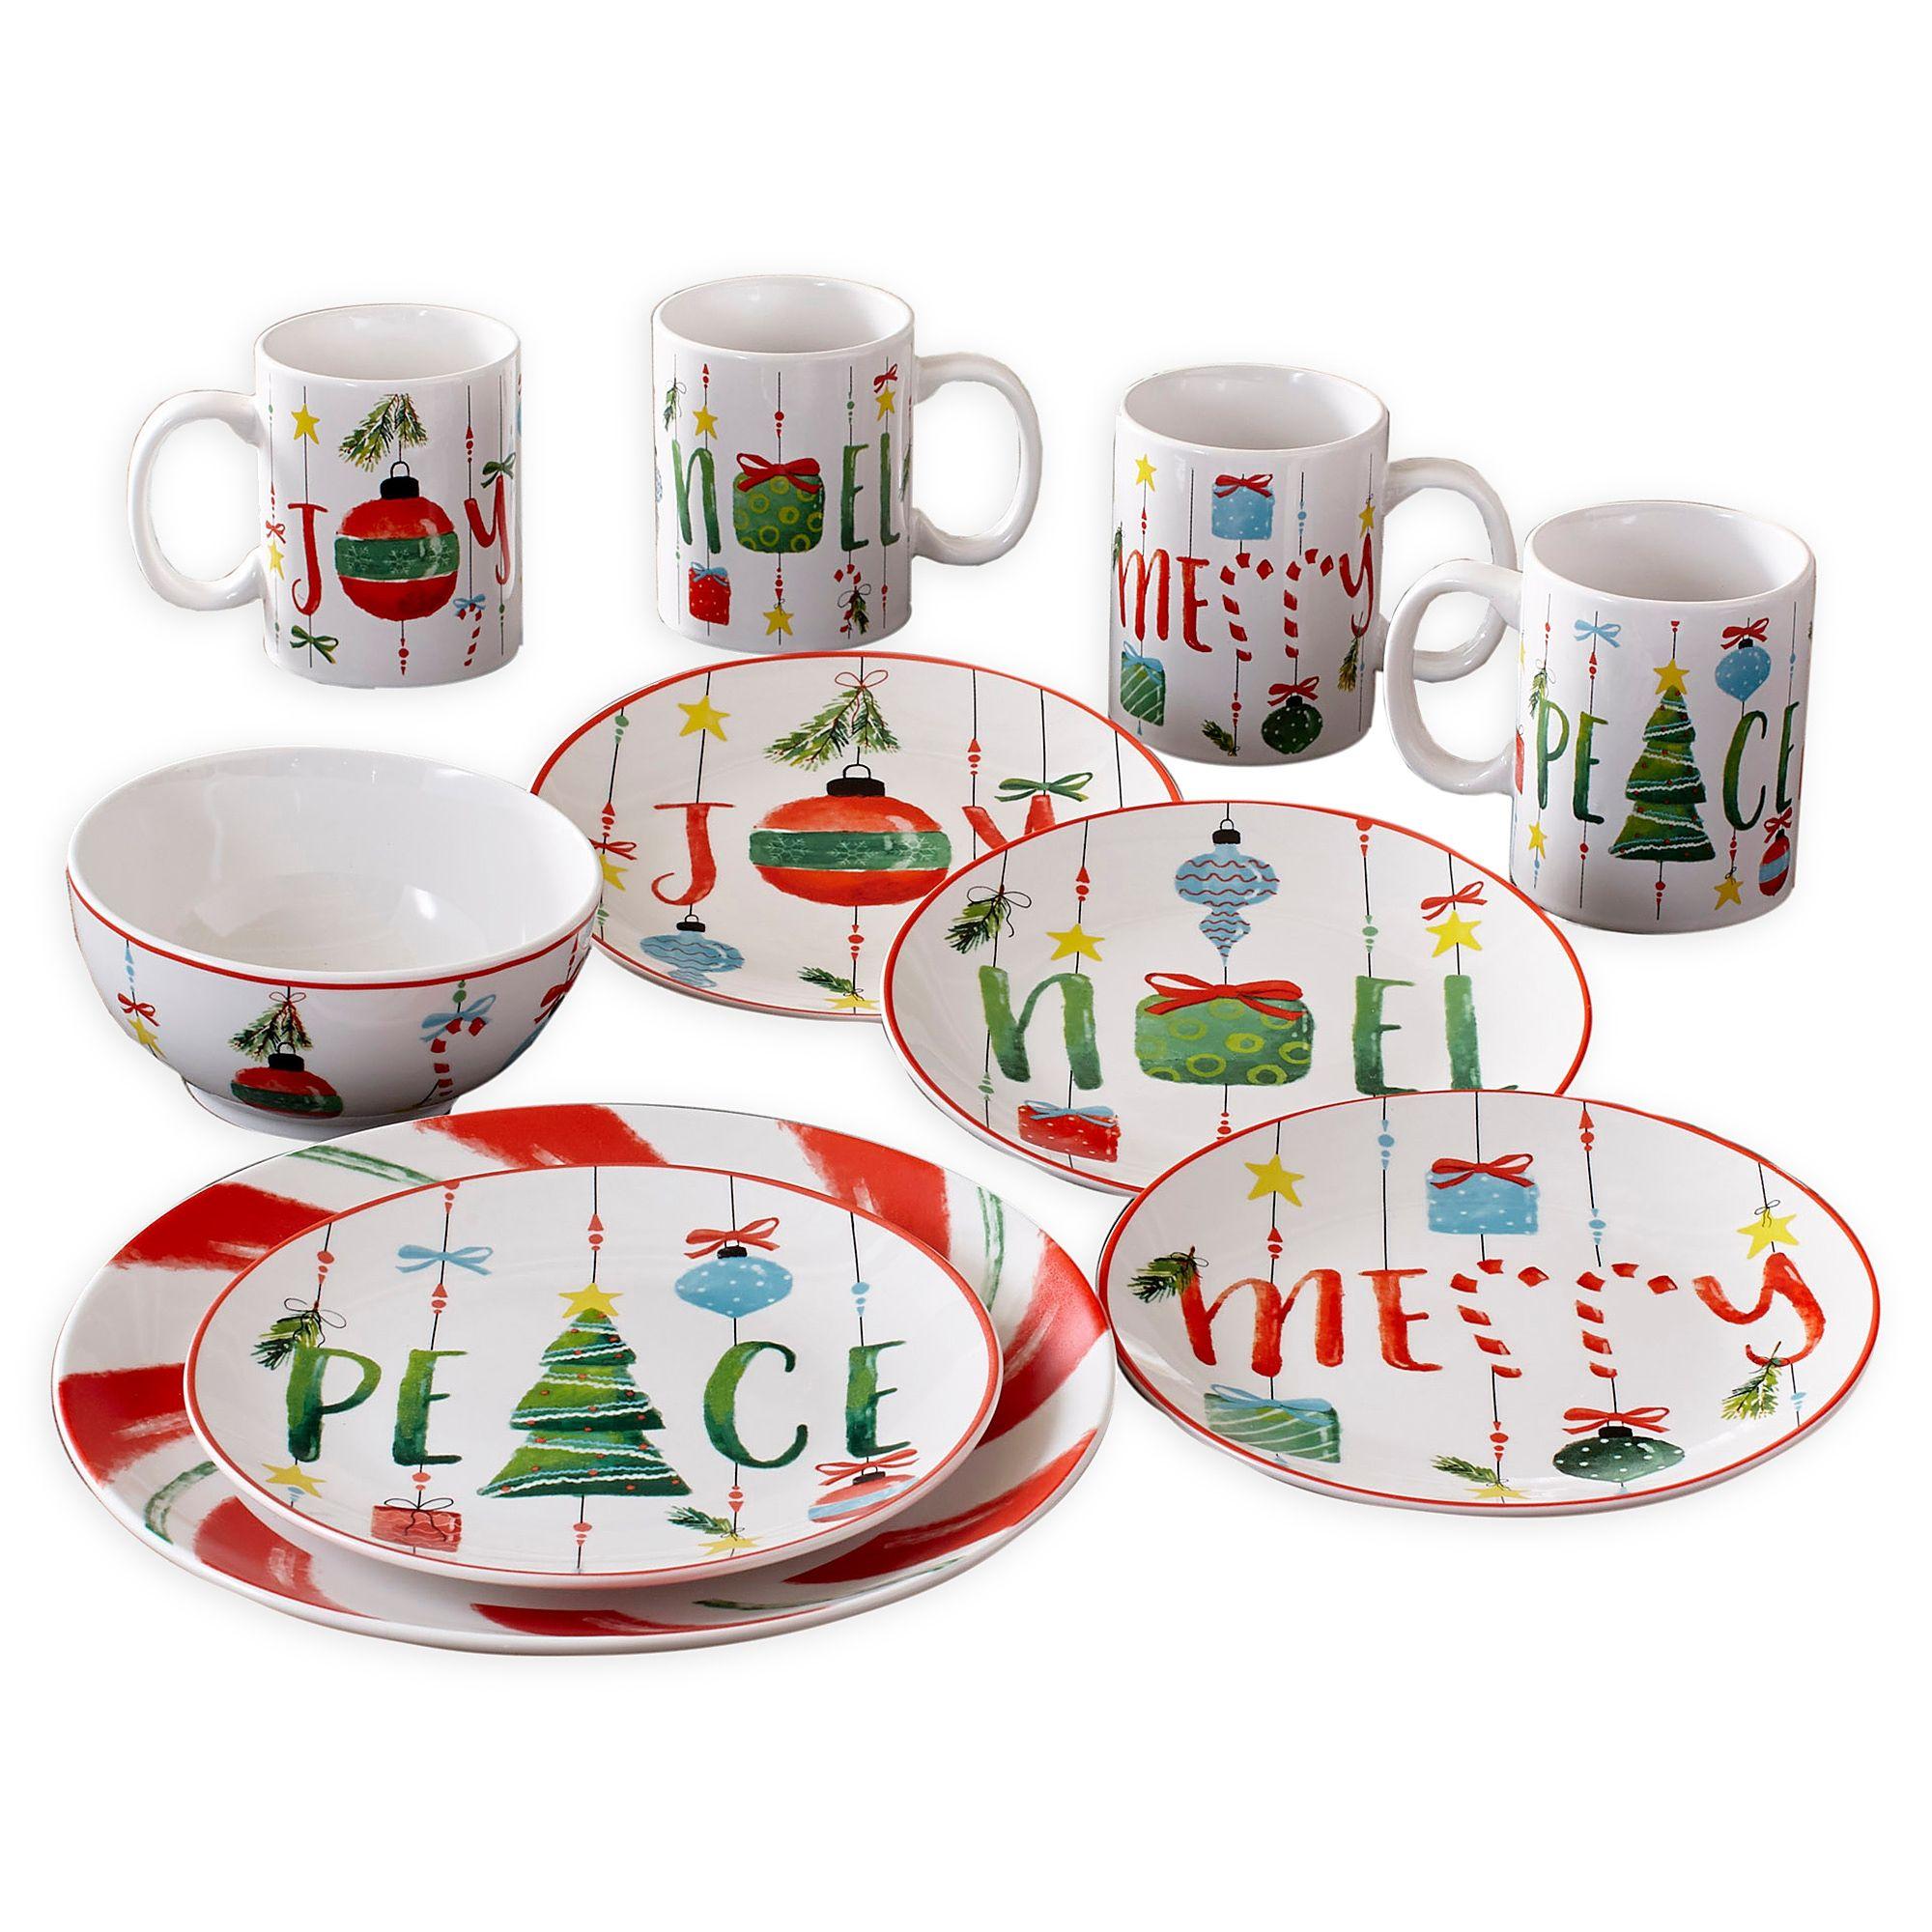 American Atelier Ornaments 16 Piece Dinnerware Set Bed Bath Beyond Christmas Dinnerware Holiday Dinnerware Christmas Dinnerware Sets